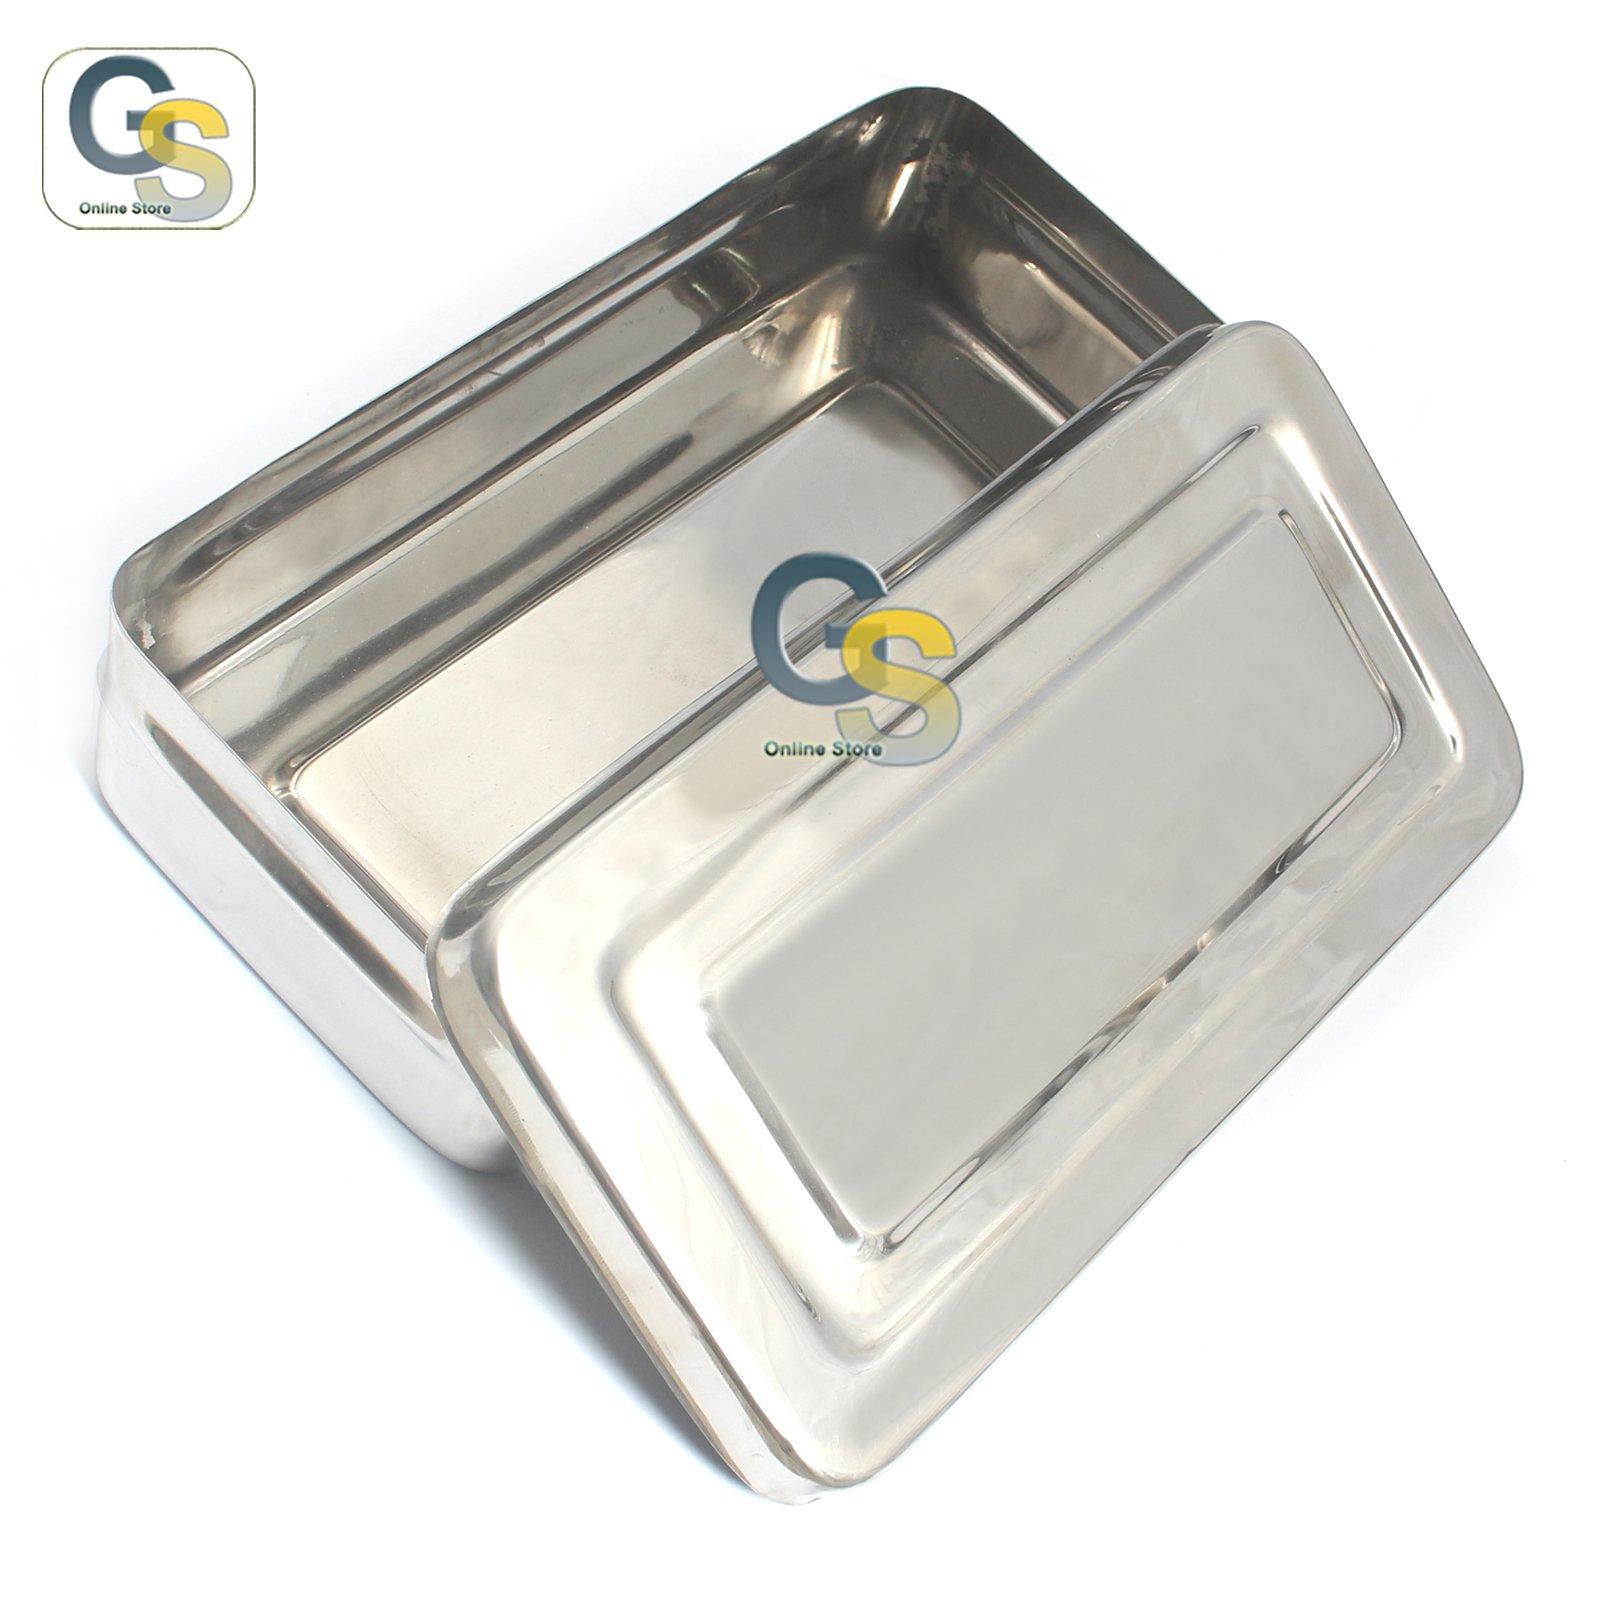 G.S INSTRUMENT BOX, 200MM X 100MM X 35MM BEST QUALITY